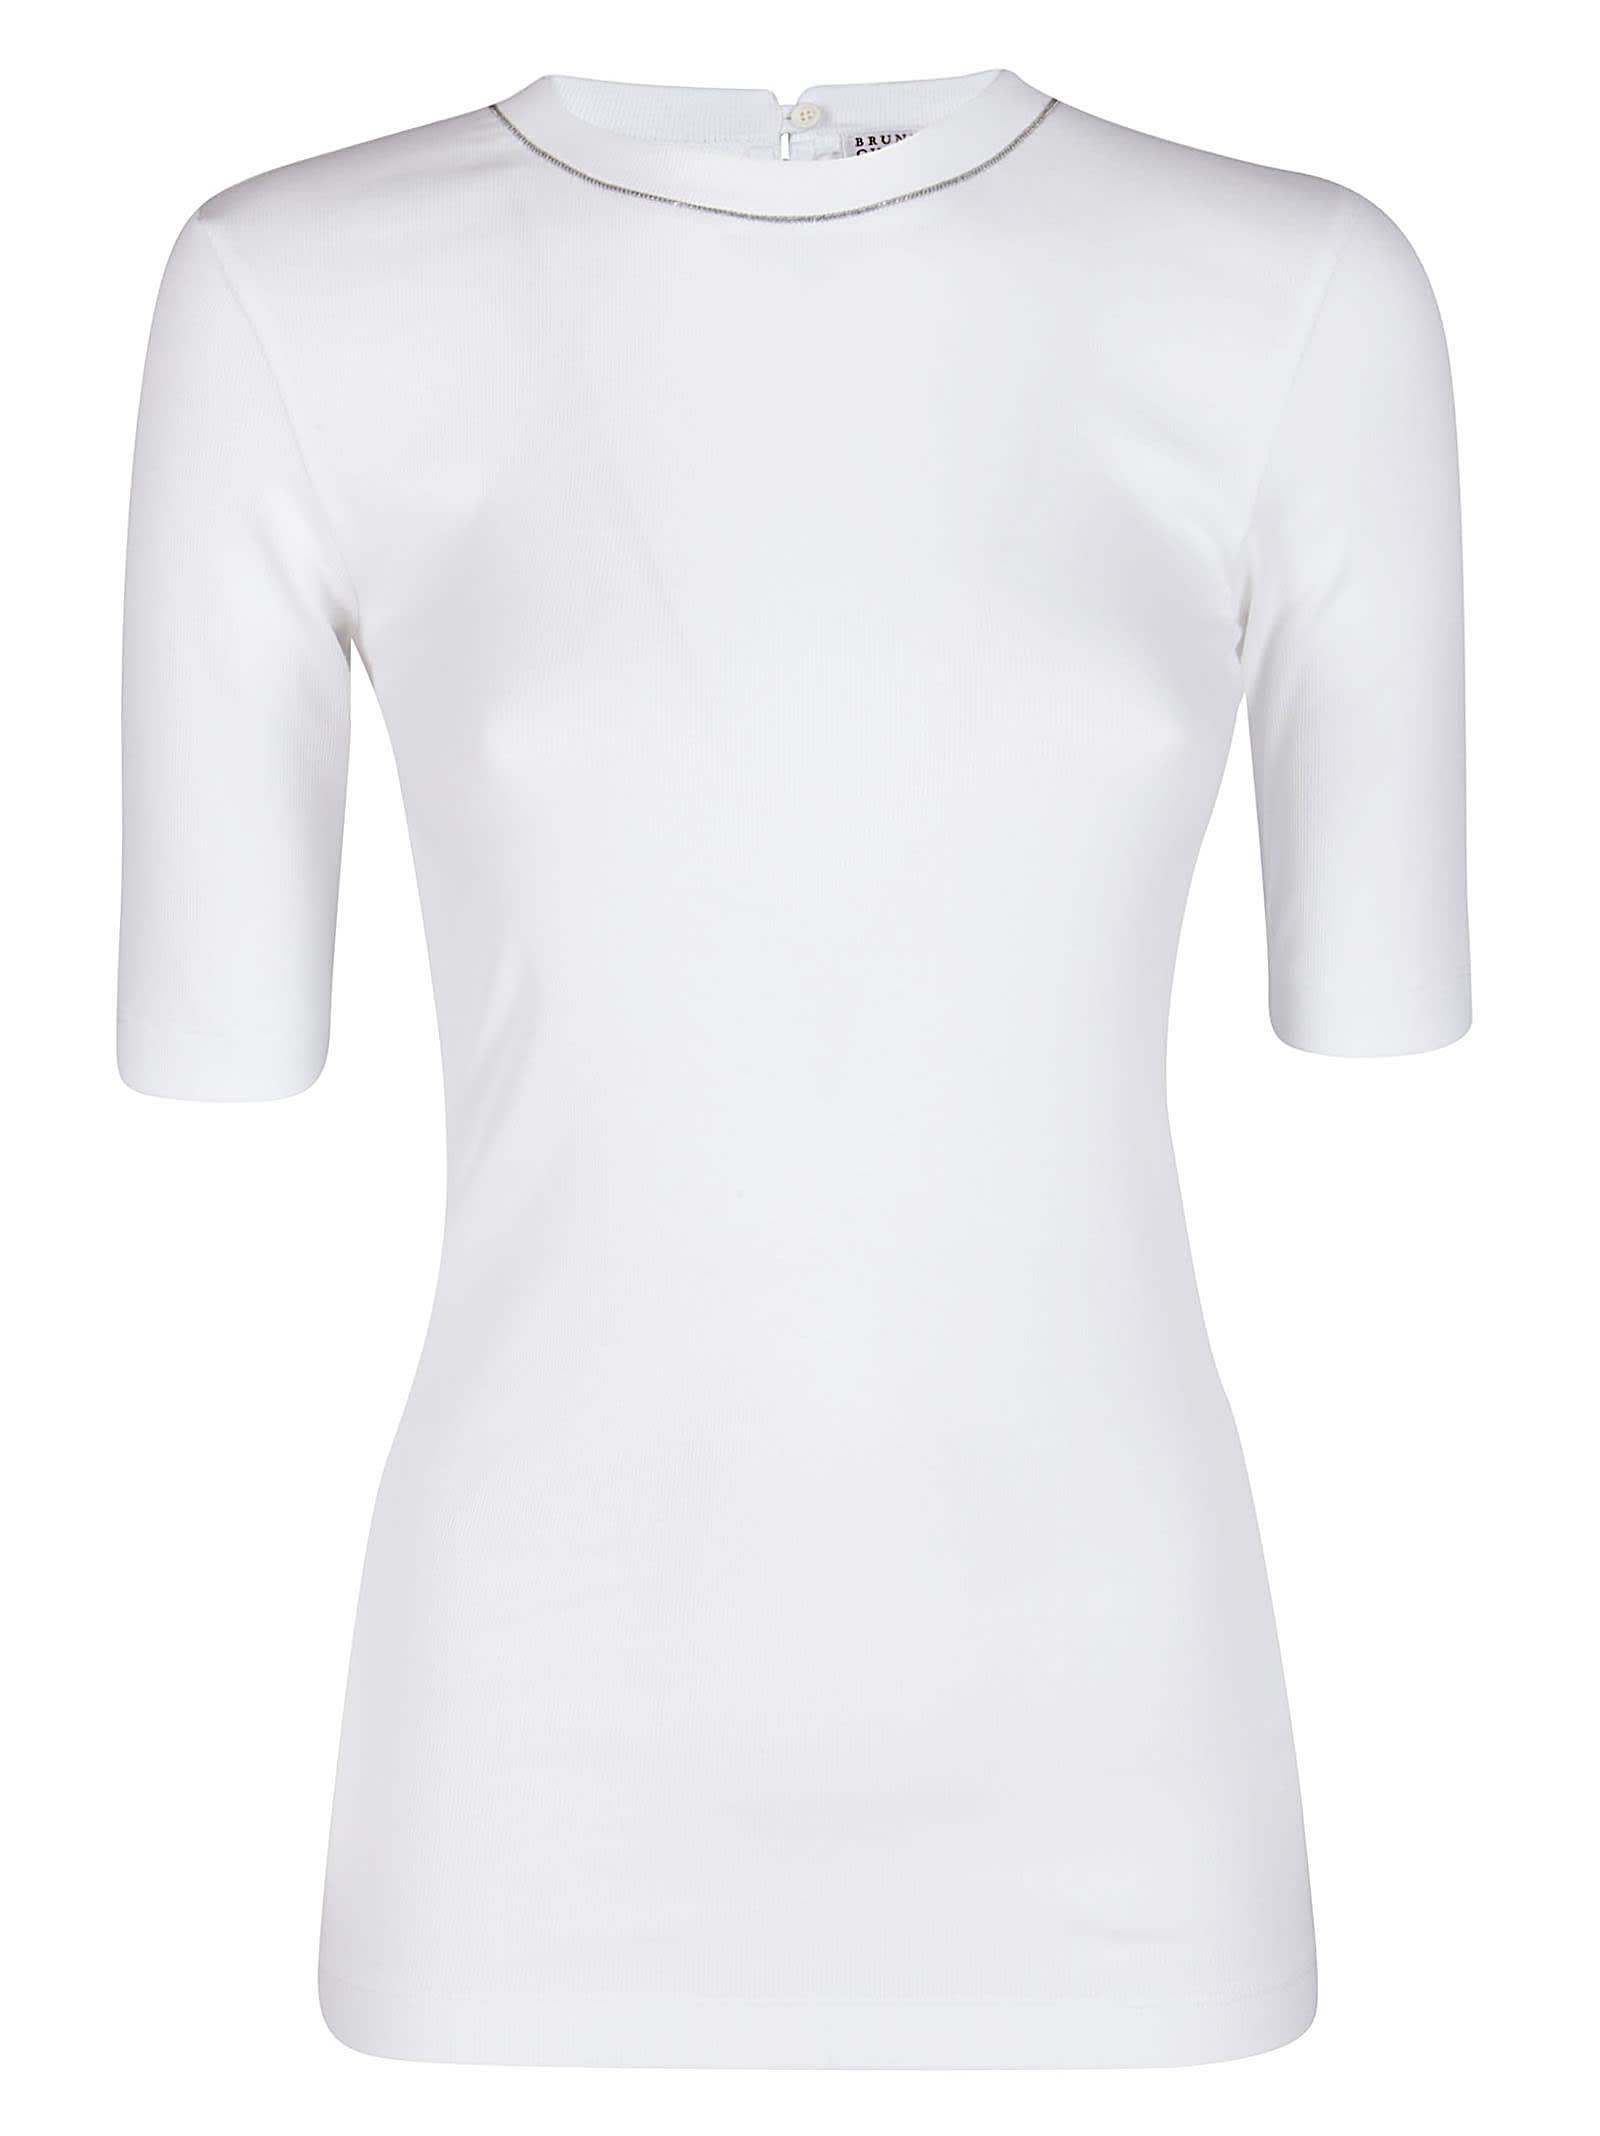 White Stretch Cotton T-shirt